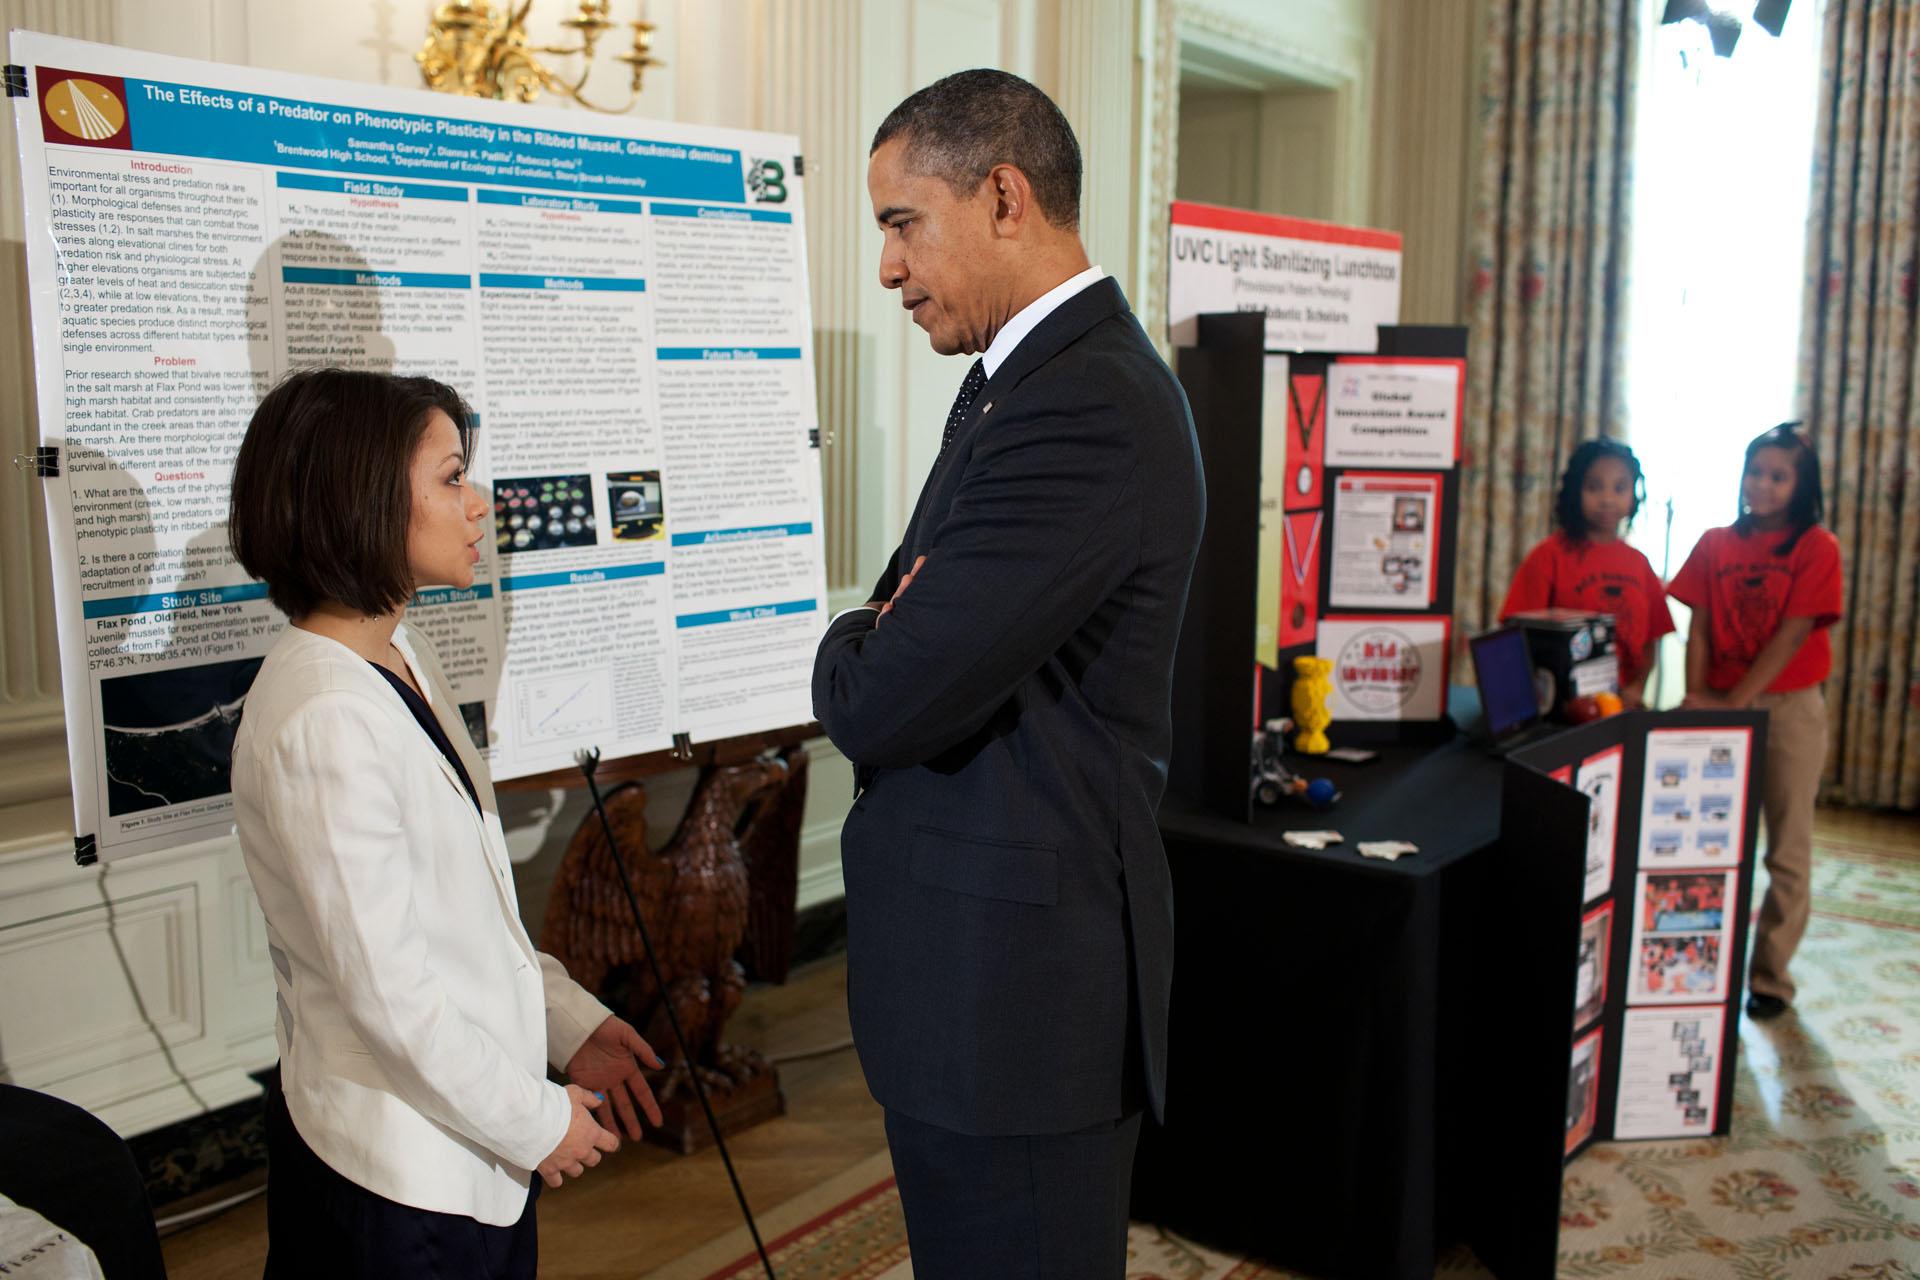 hight resolution of President Obama Hosts the White House Science Fair   whitehouse.gov